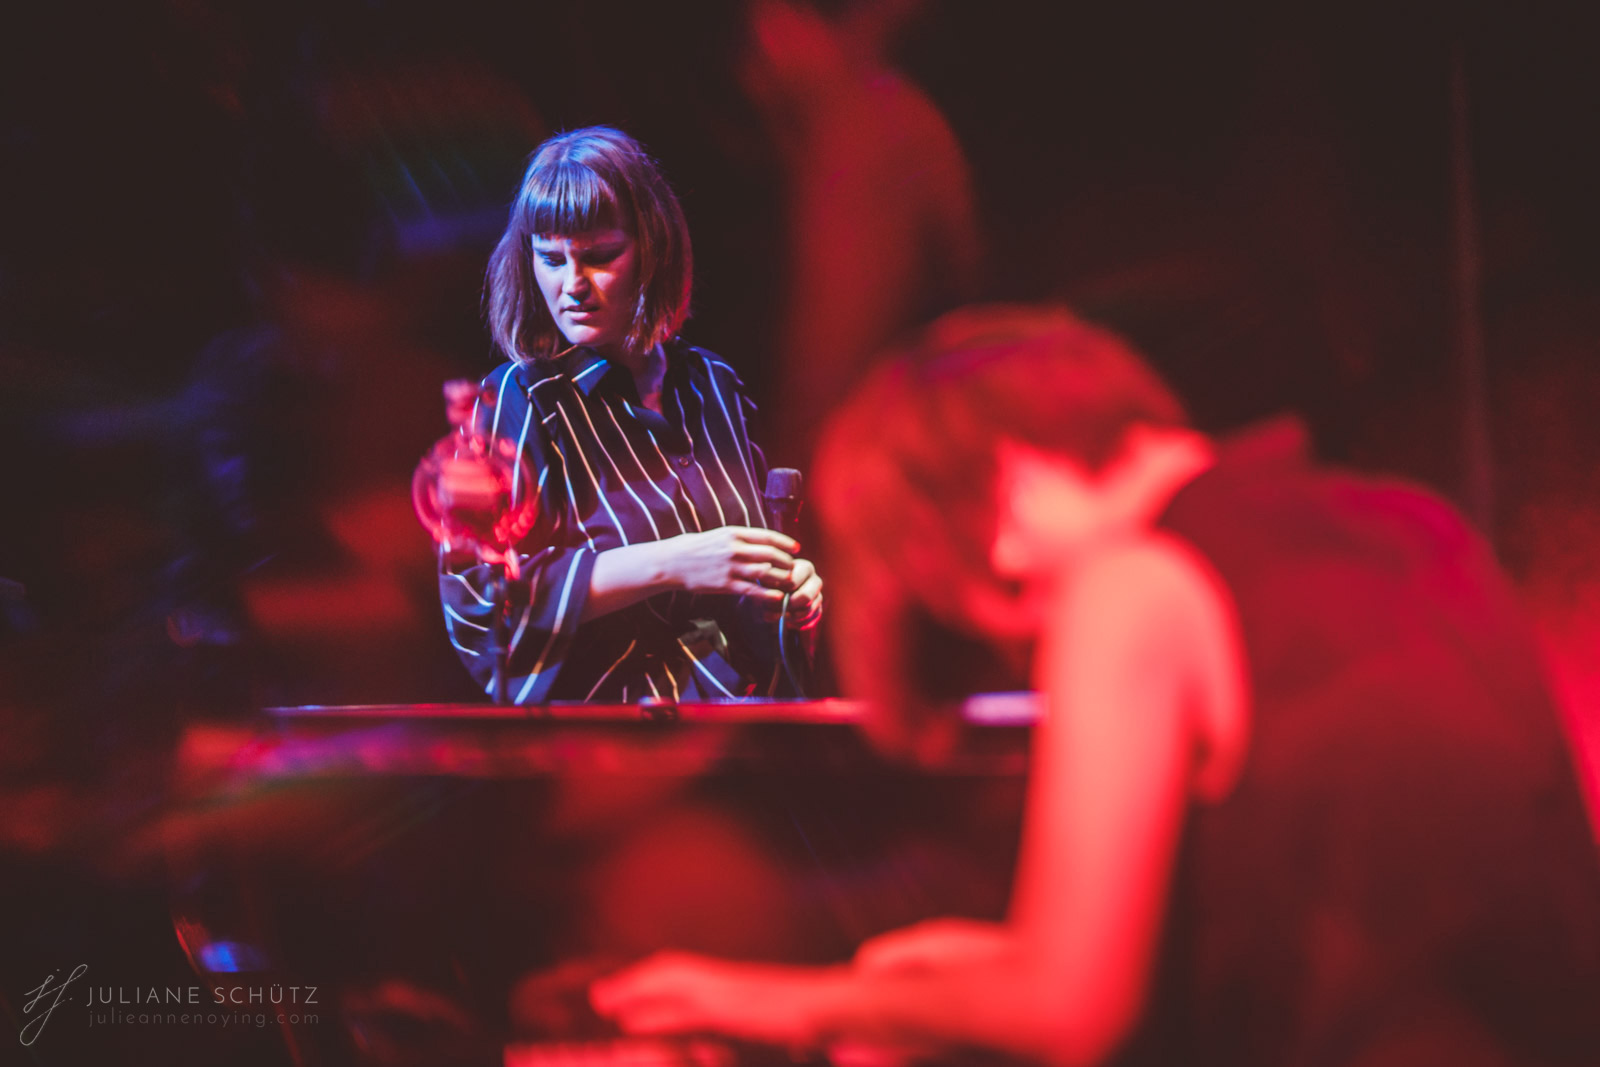 Reiko Okuda + Hanna Schörken @ A L'ARME 2019 | © Juliane Schütz